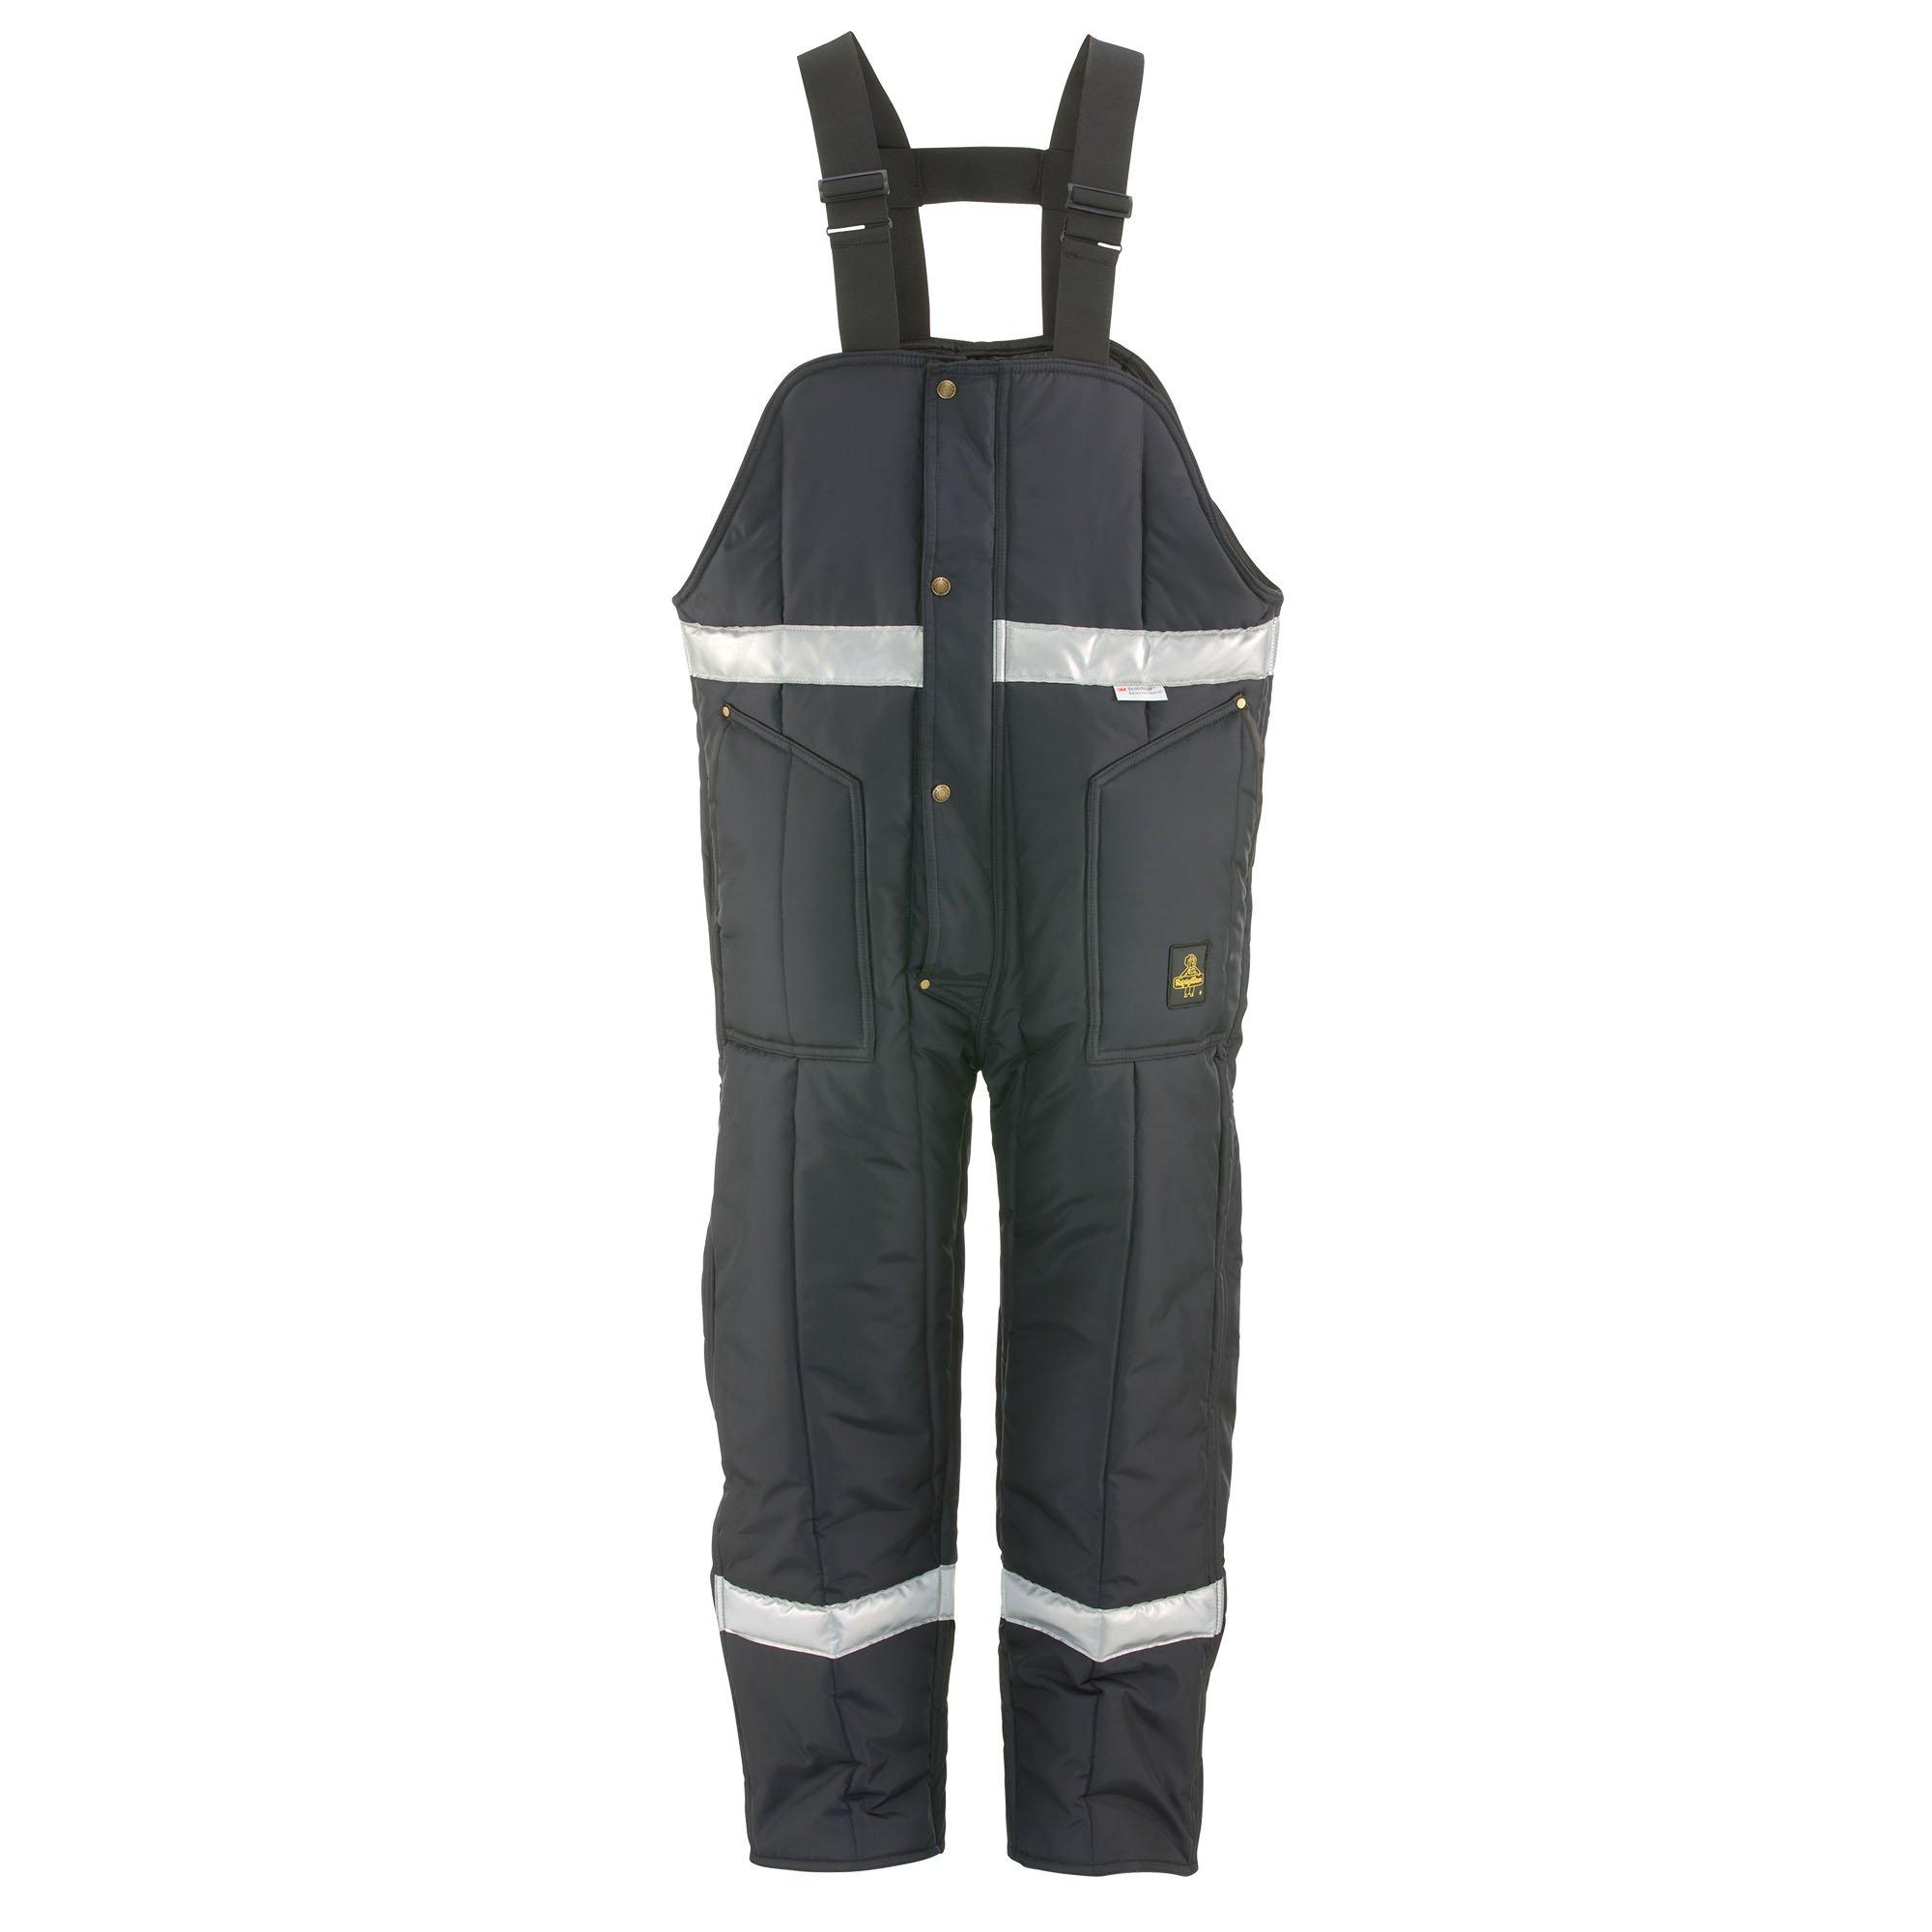 RefrigiWear Men's Iron-Tuff Enhanced Visibility High Bib, Navy, 3XL Short by Refrigiwear (Image #1)